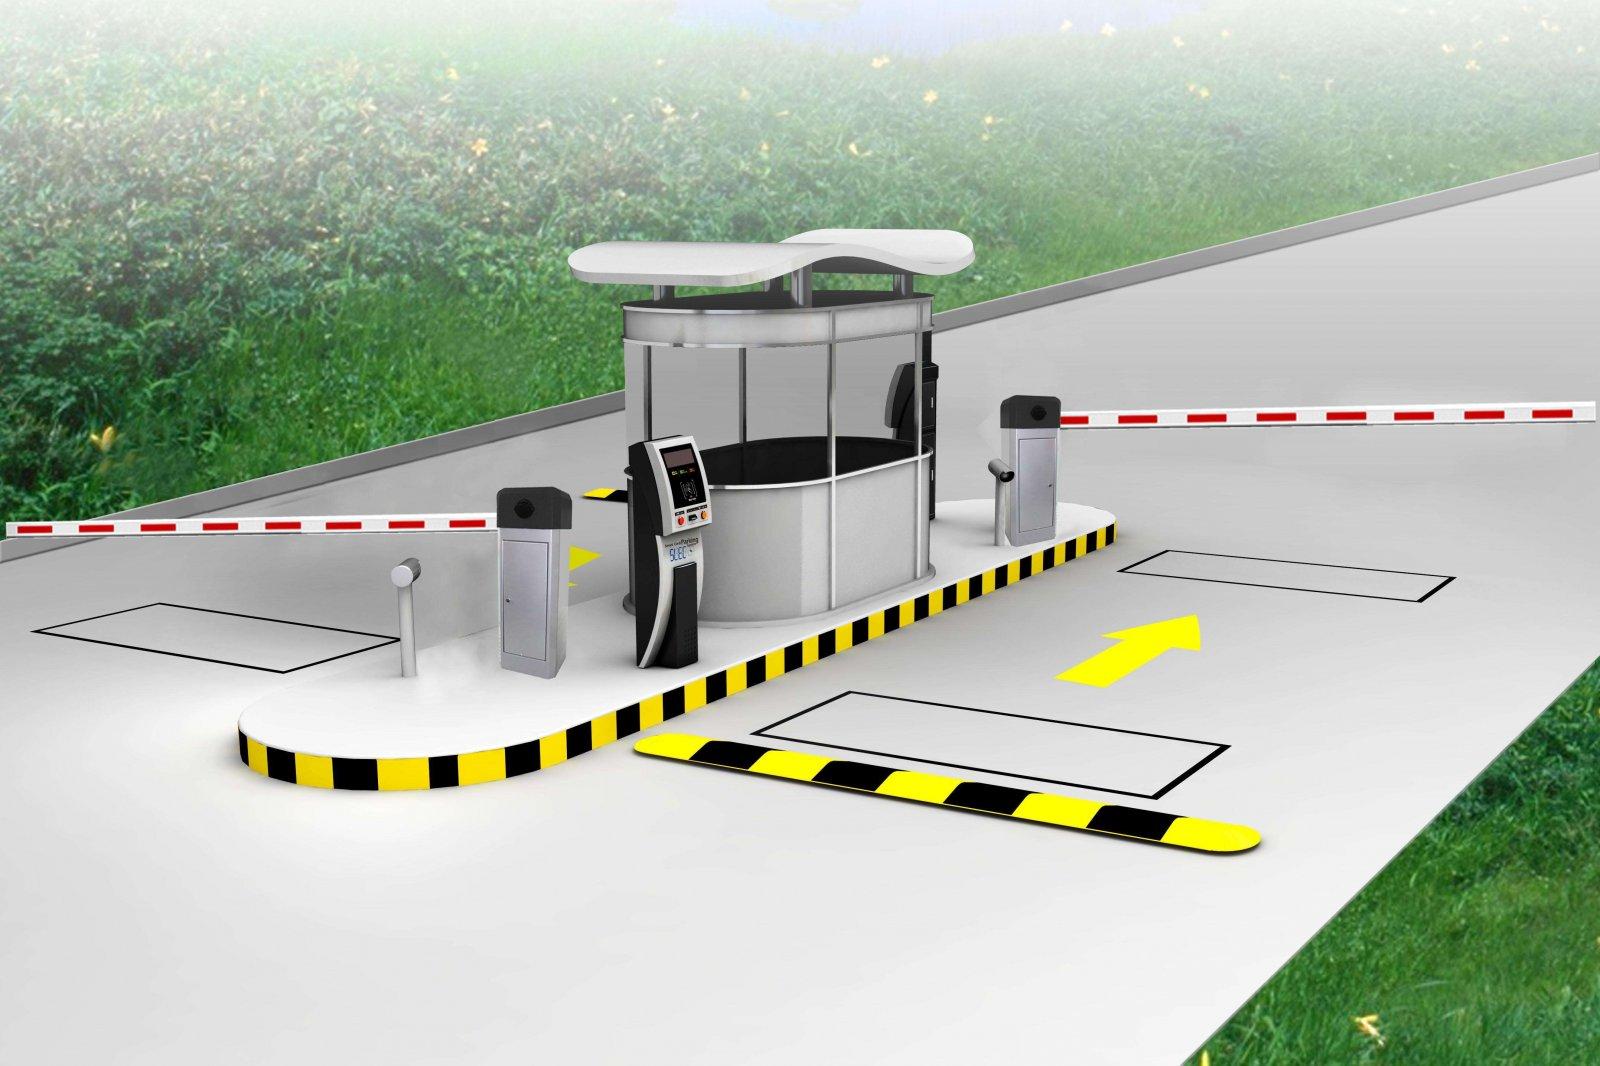 Микрон parking: RFID-парковка с идентификацией на расстоянии до 15 м